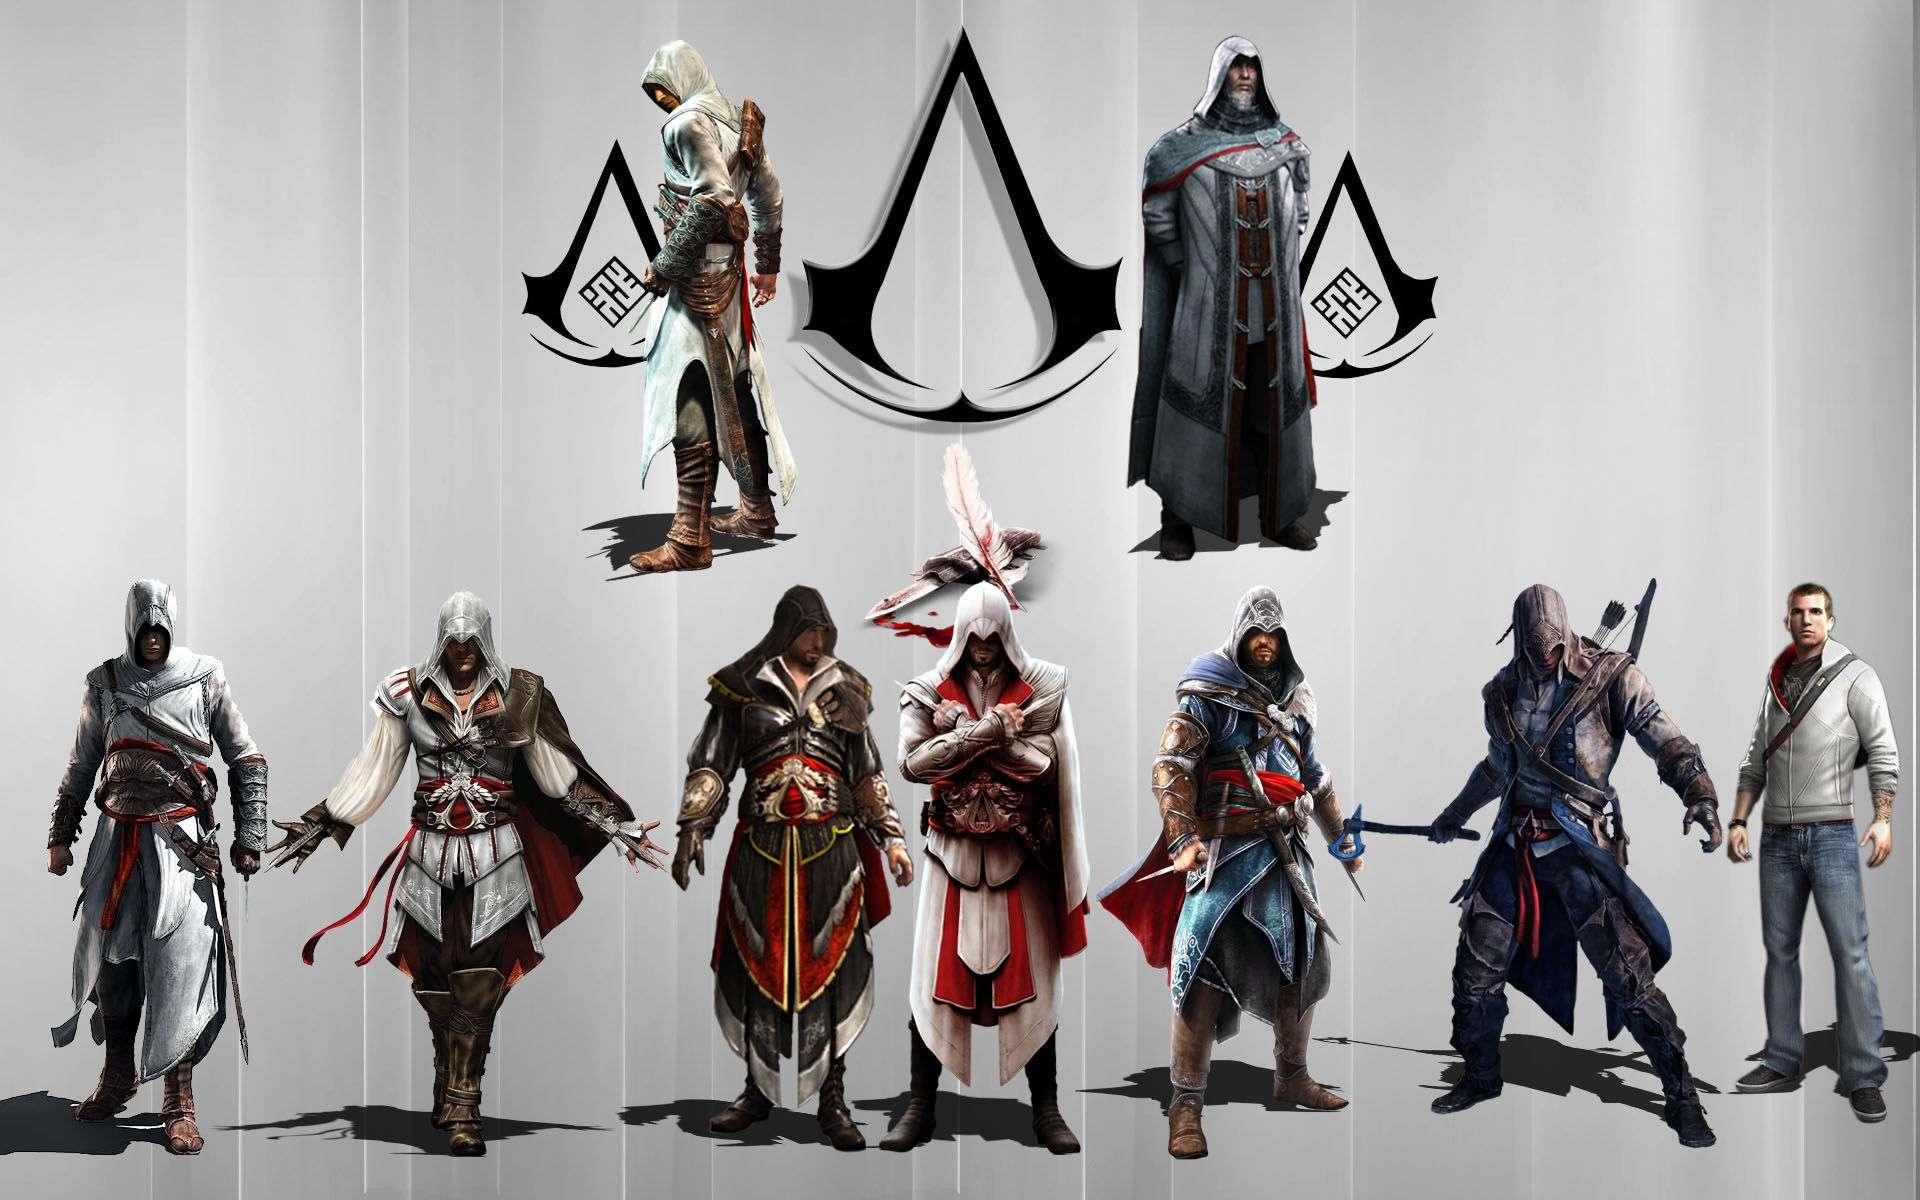 Assain Creed Video Game Wallpaper 036